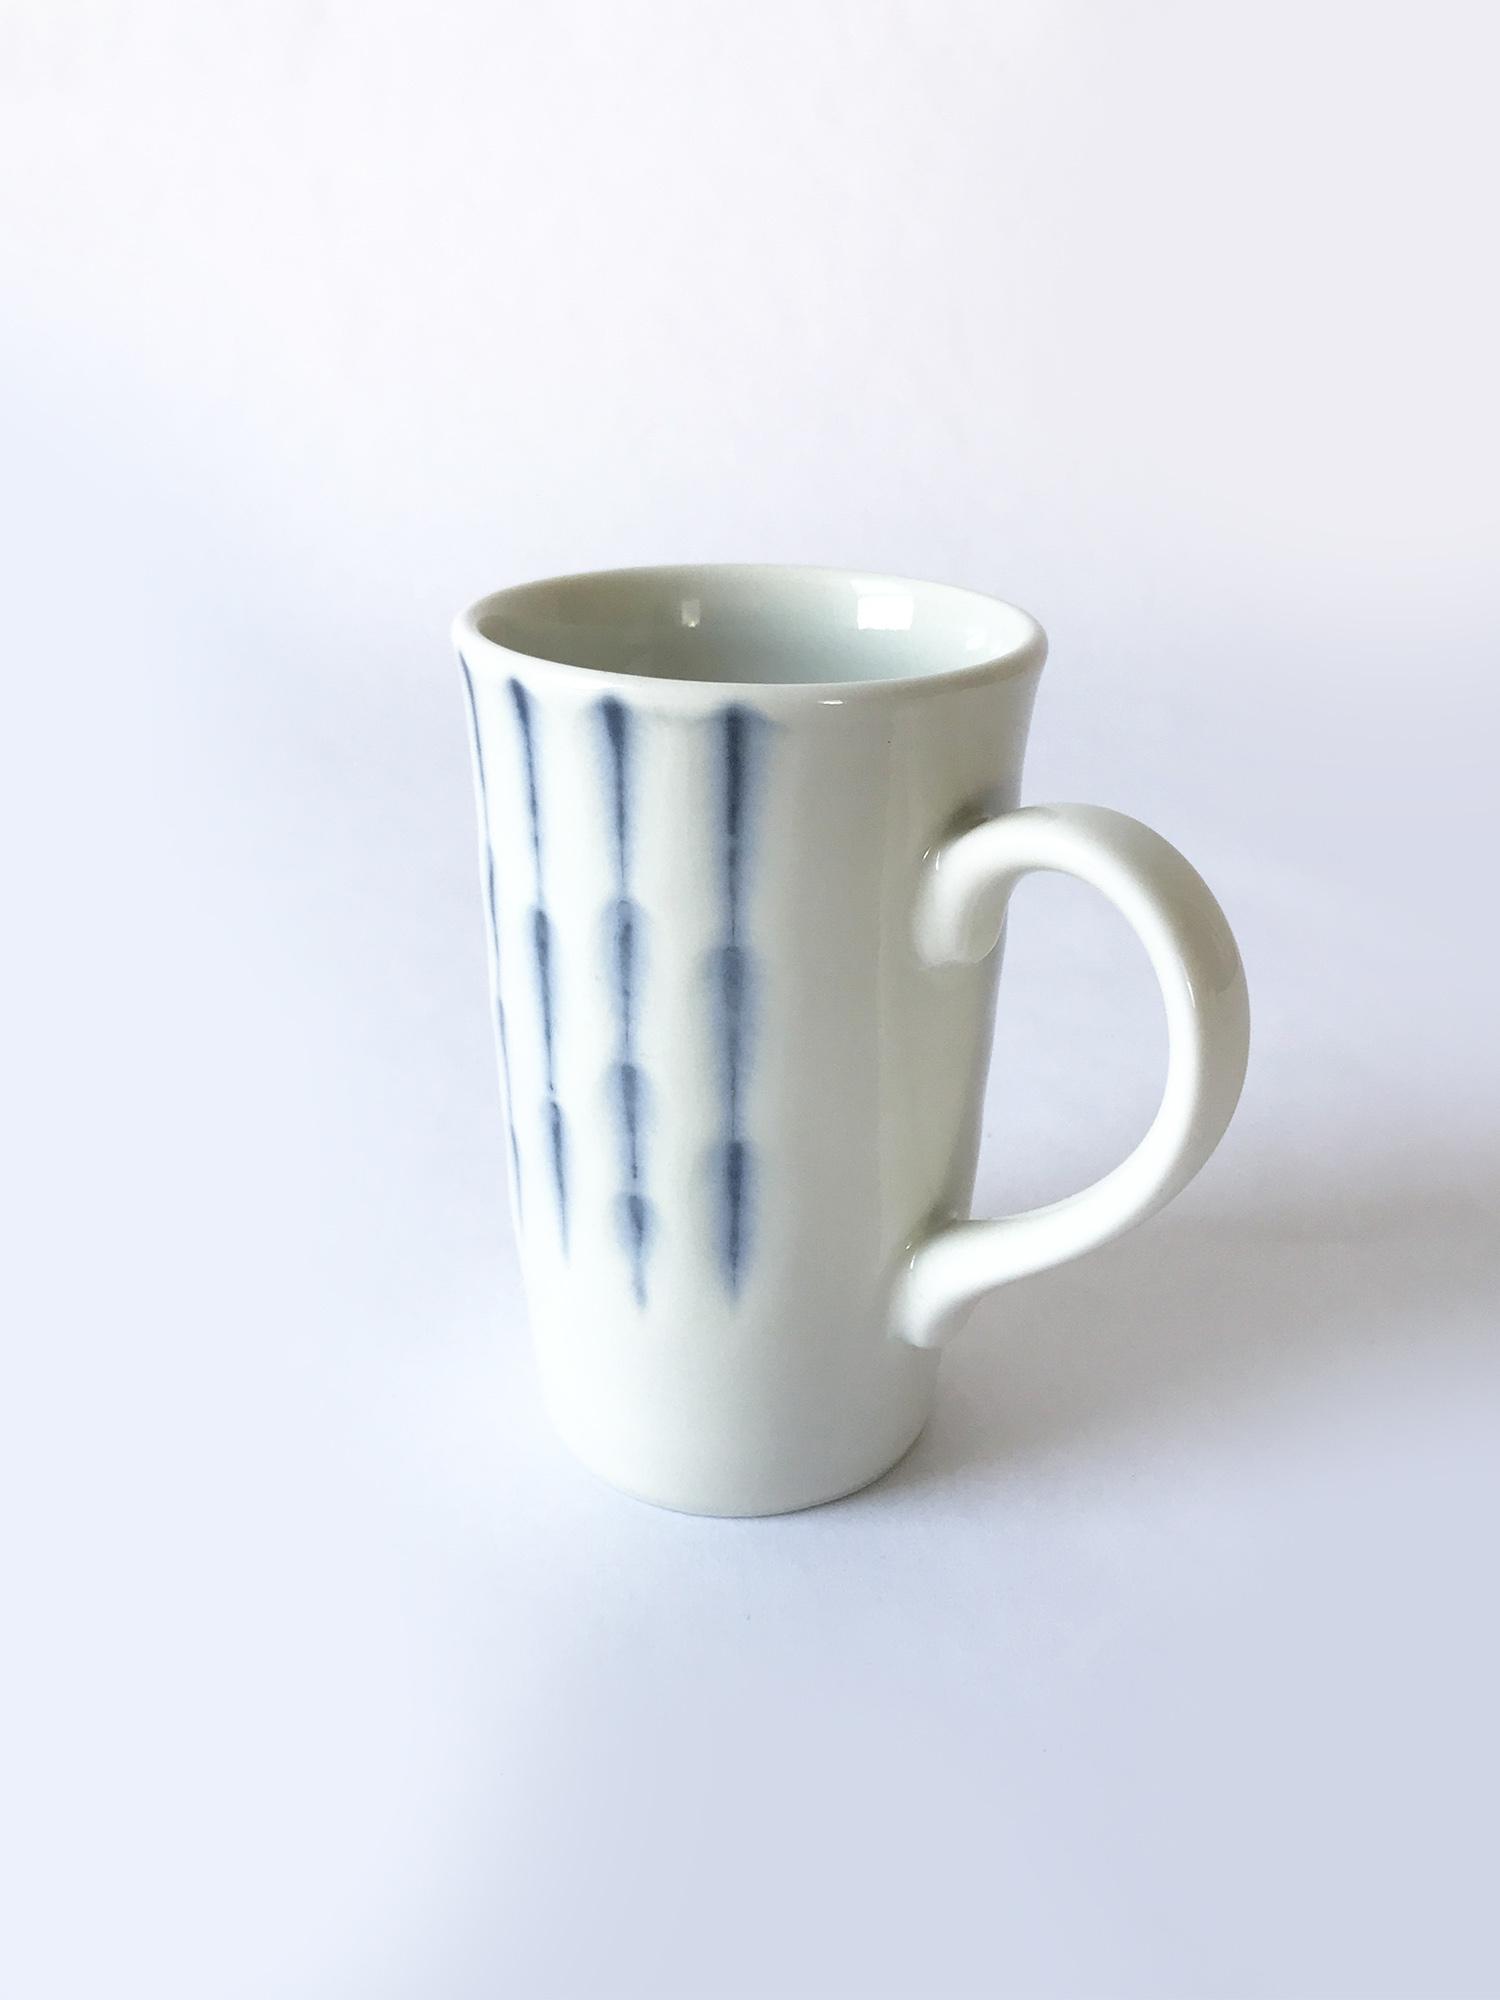 Miya Coffee Mug with Feathered Blue Stripes-2